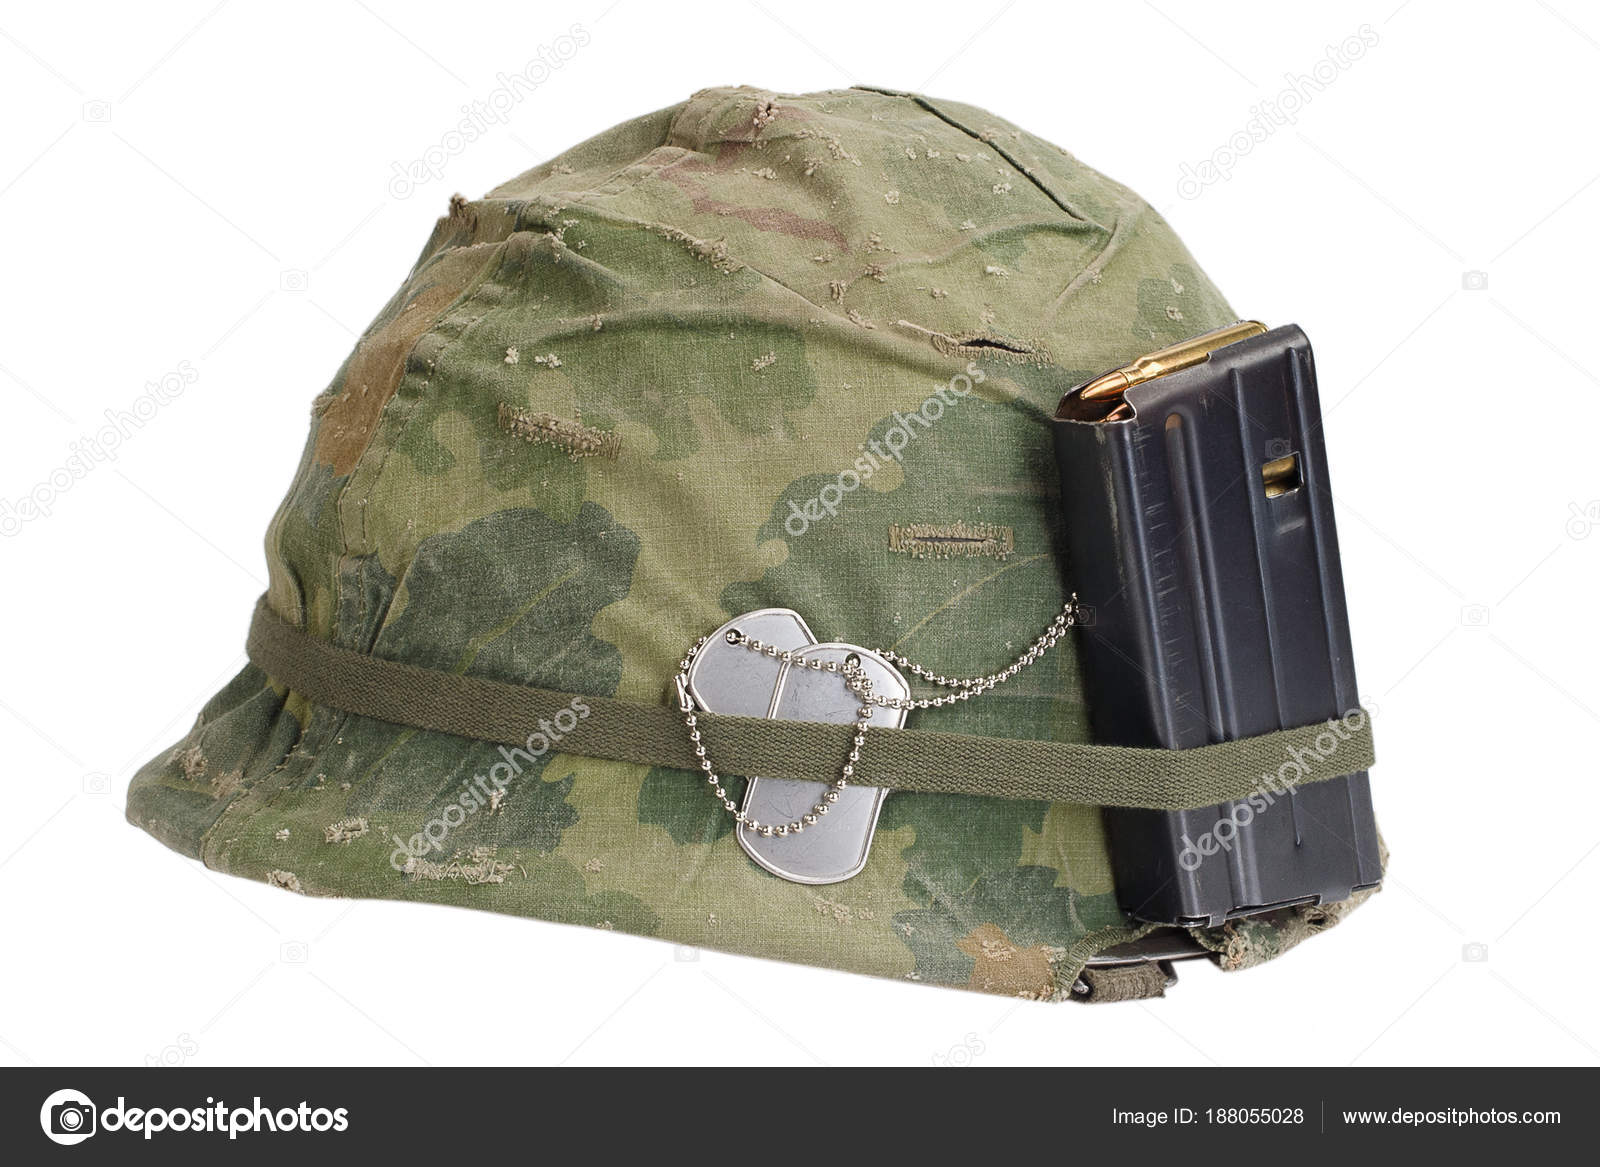 Pictures Army Helmets Army Helmet Vietnam War Period Camouflage Cover Magazine Ammot Dog Stock Photo C Zim90 188055028